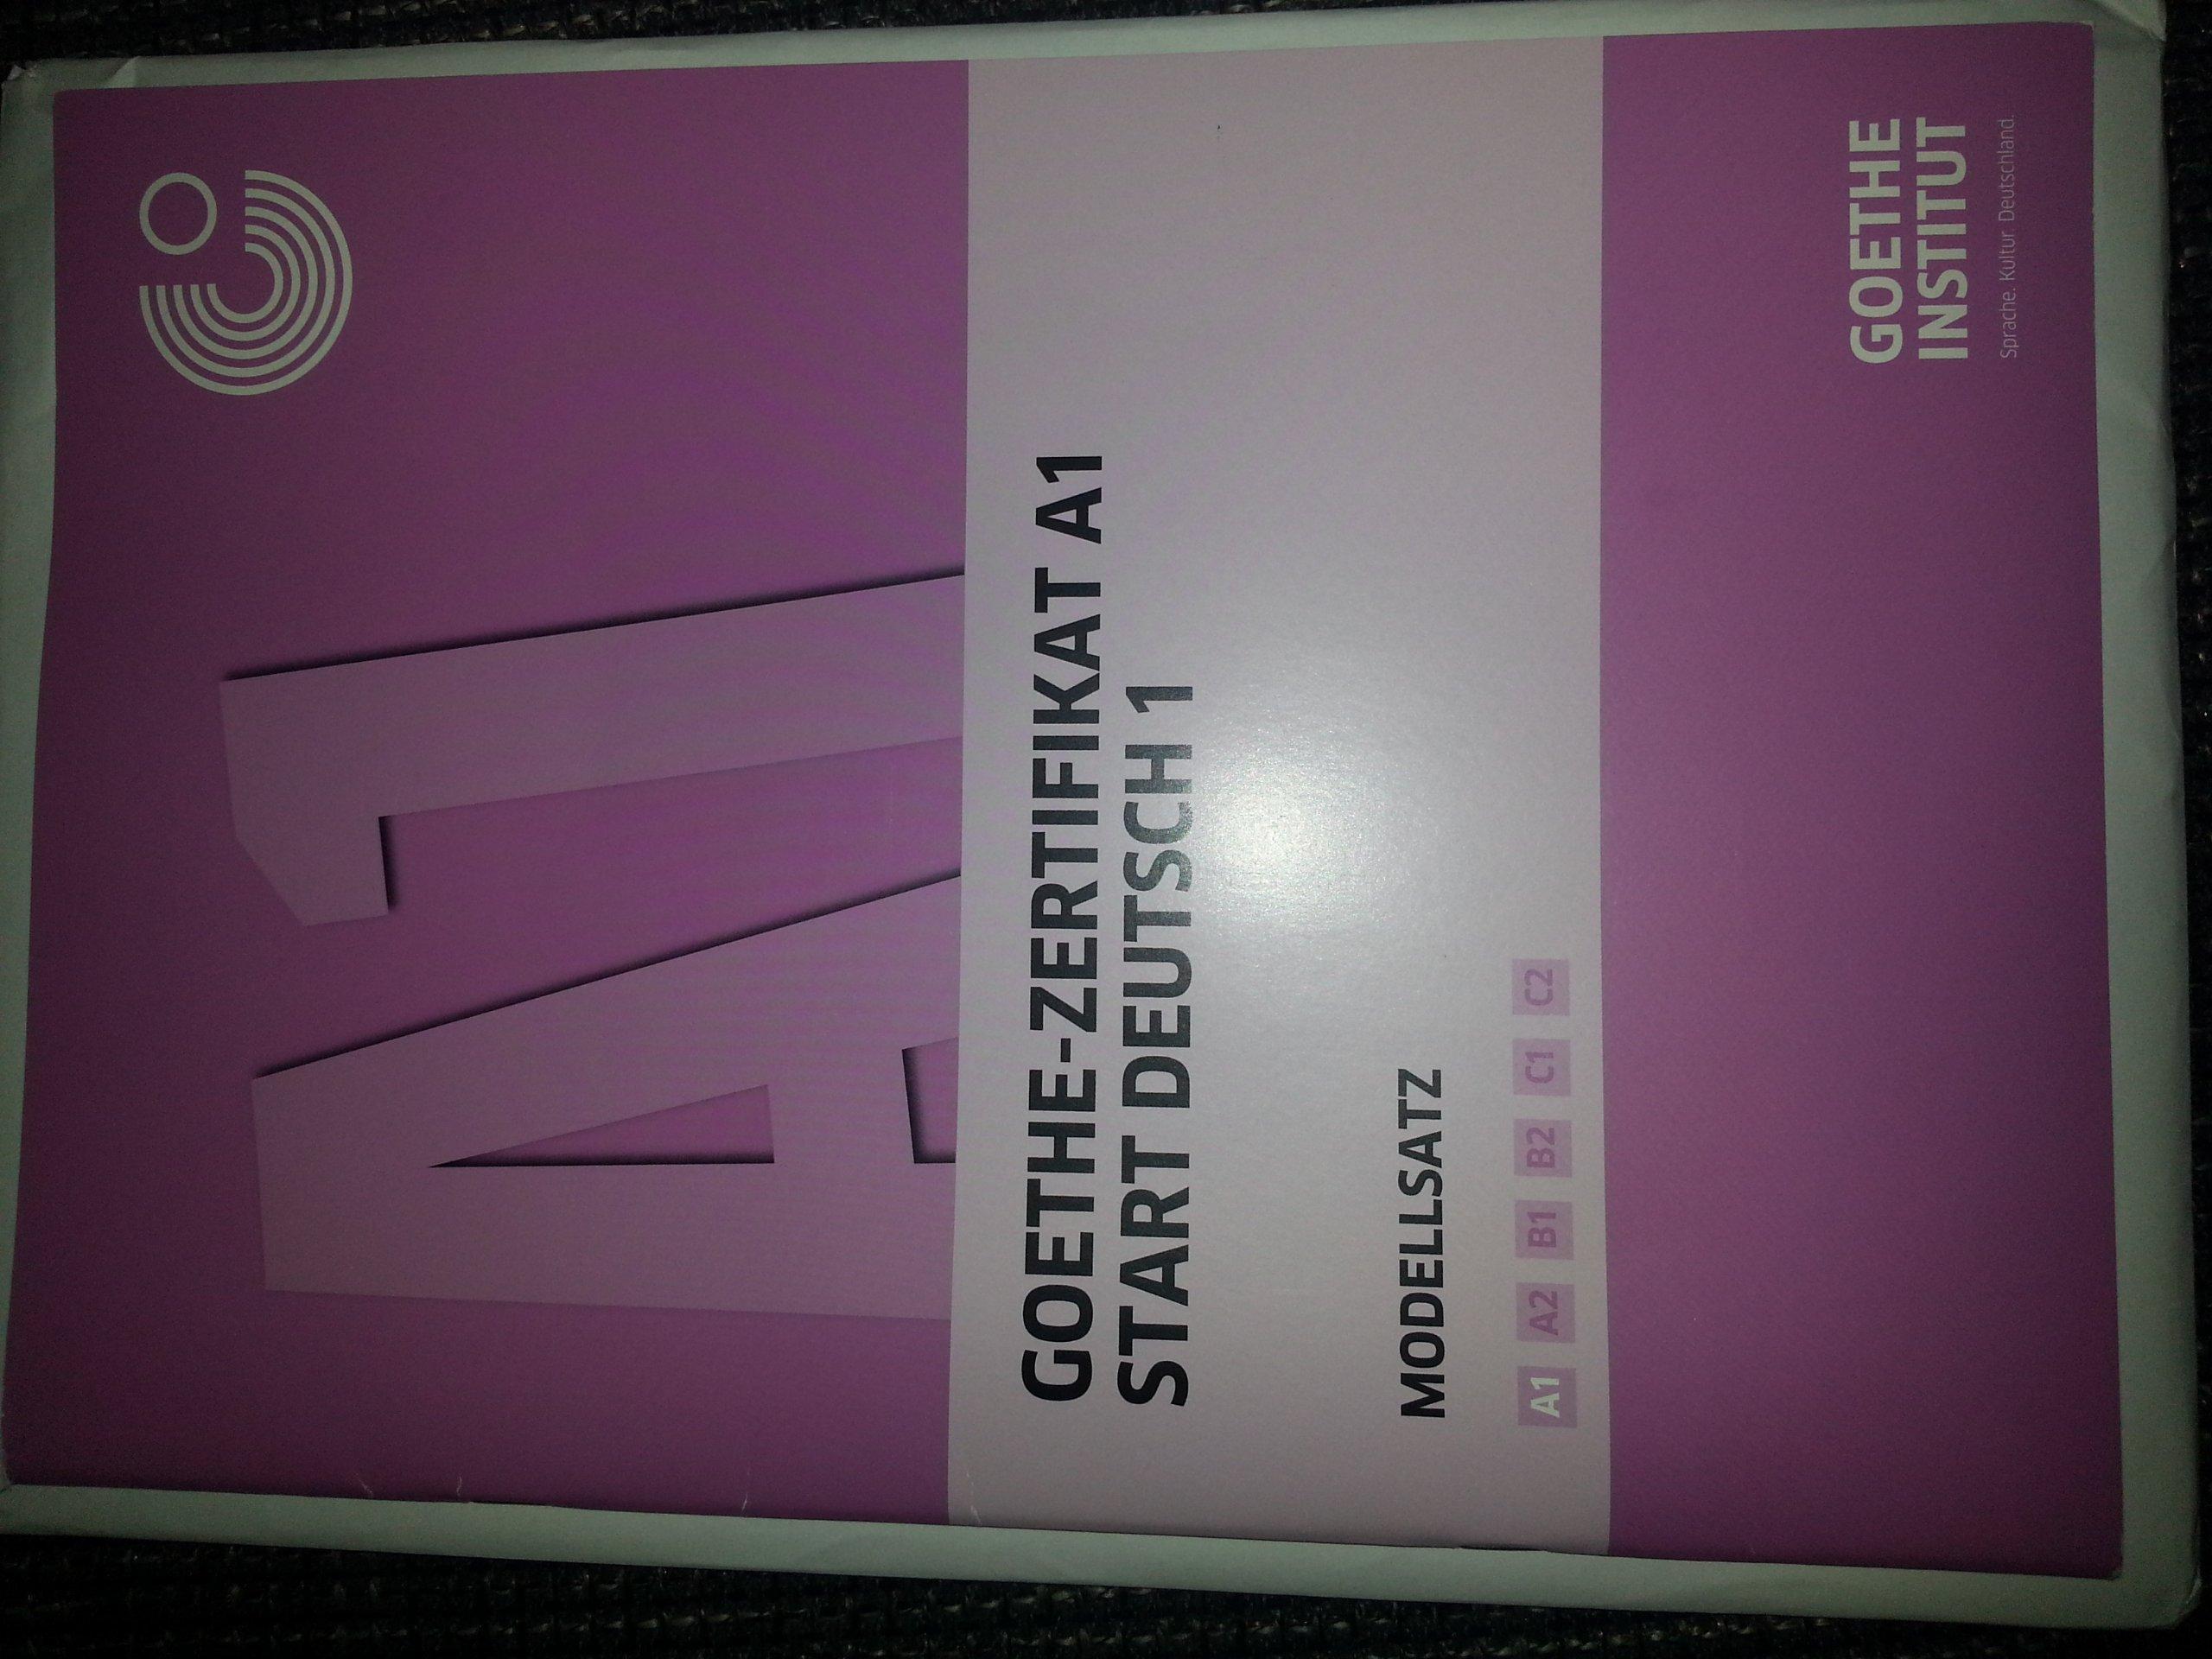 Goethe Zertifikat A1 Modellsatz Goethe Zertifikat A1 Start